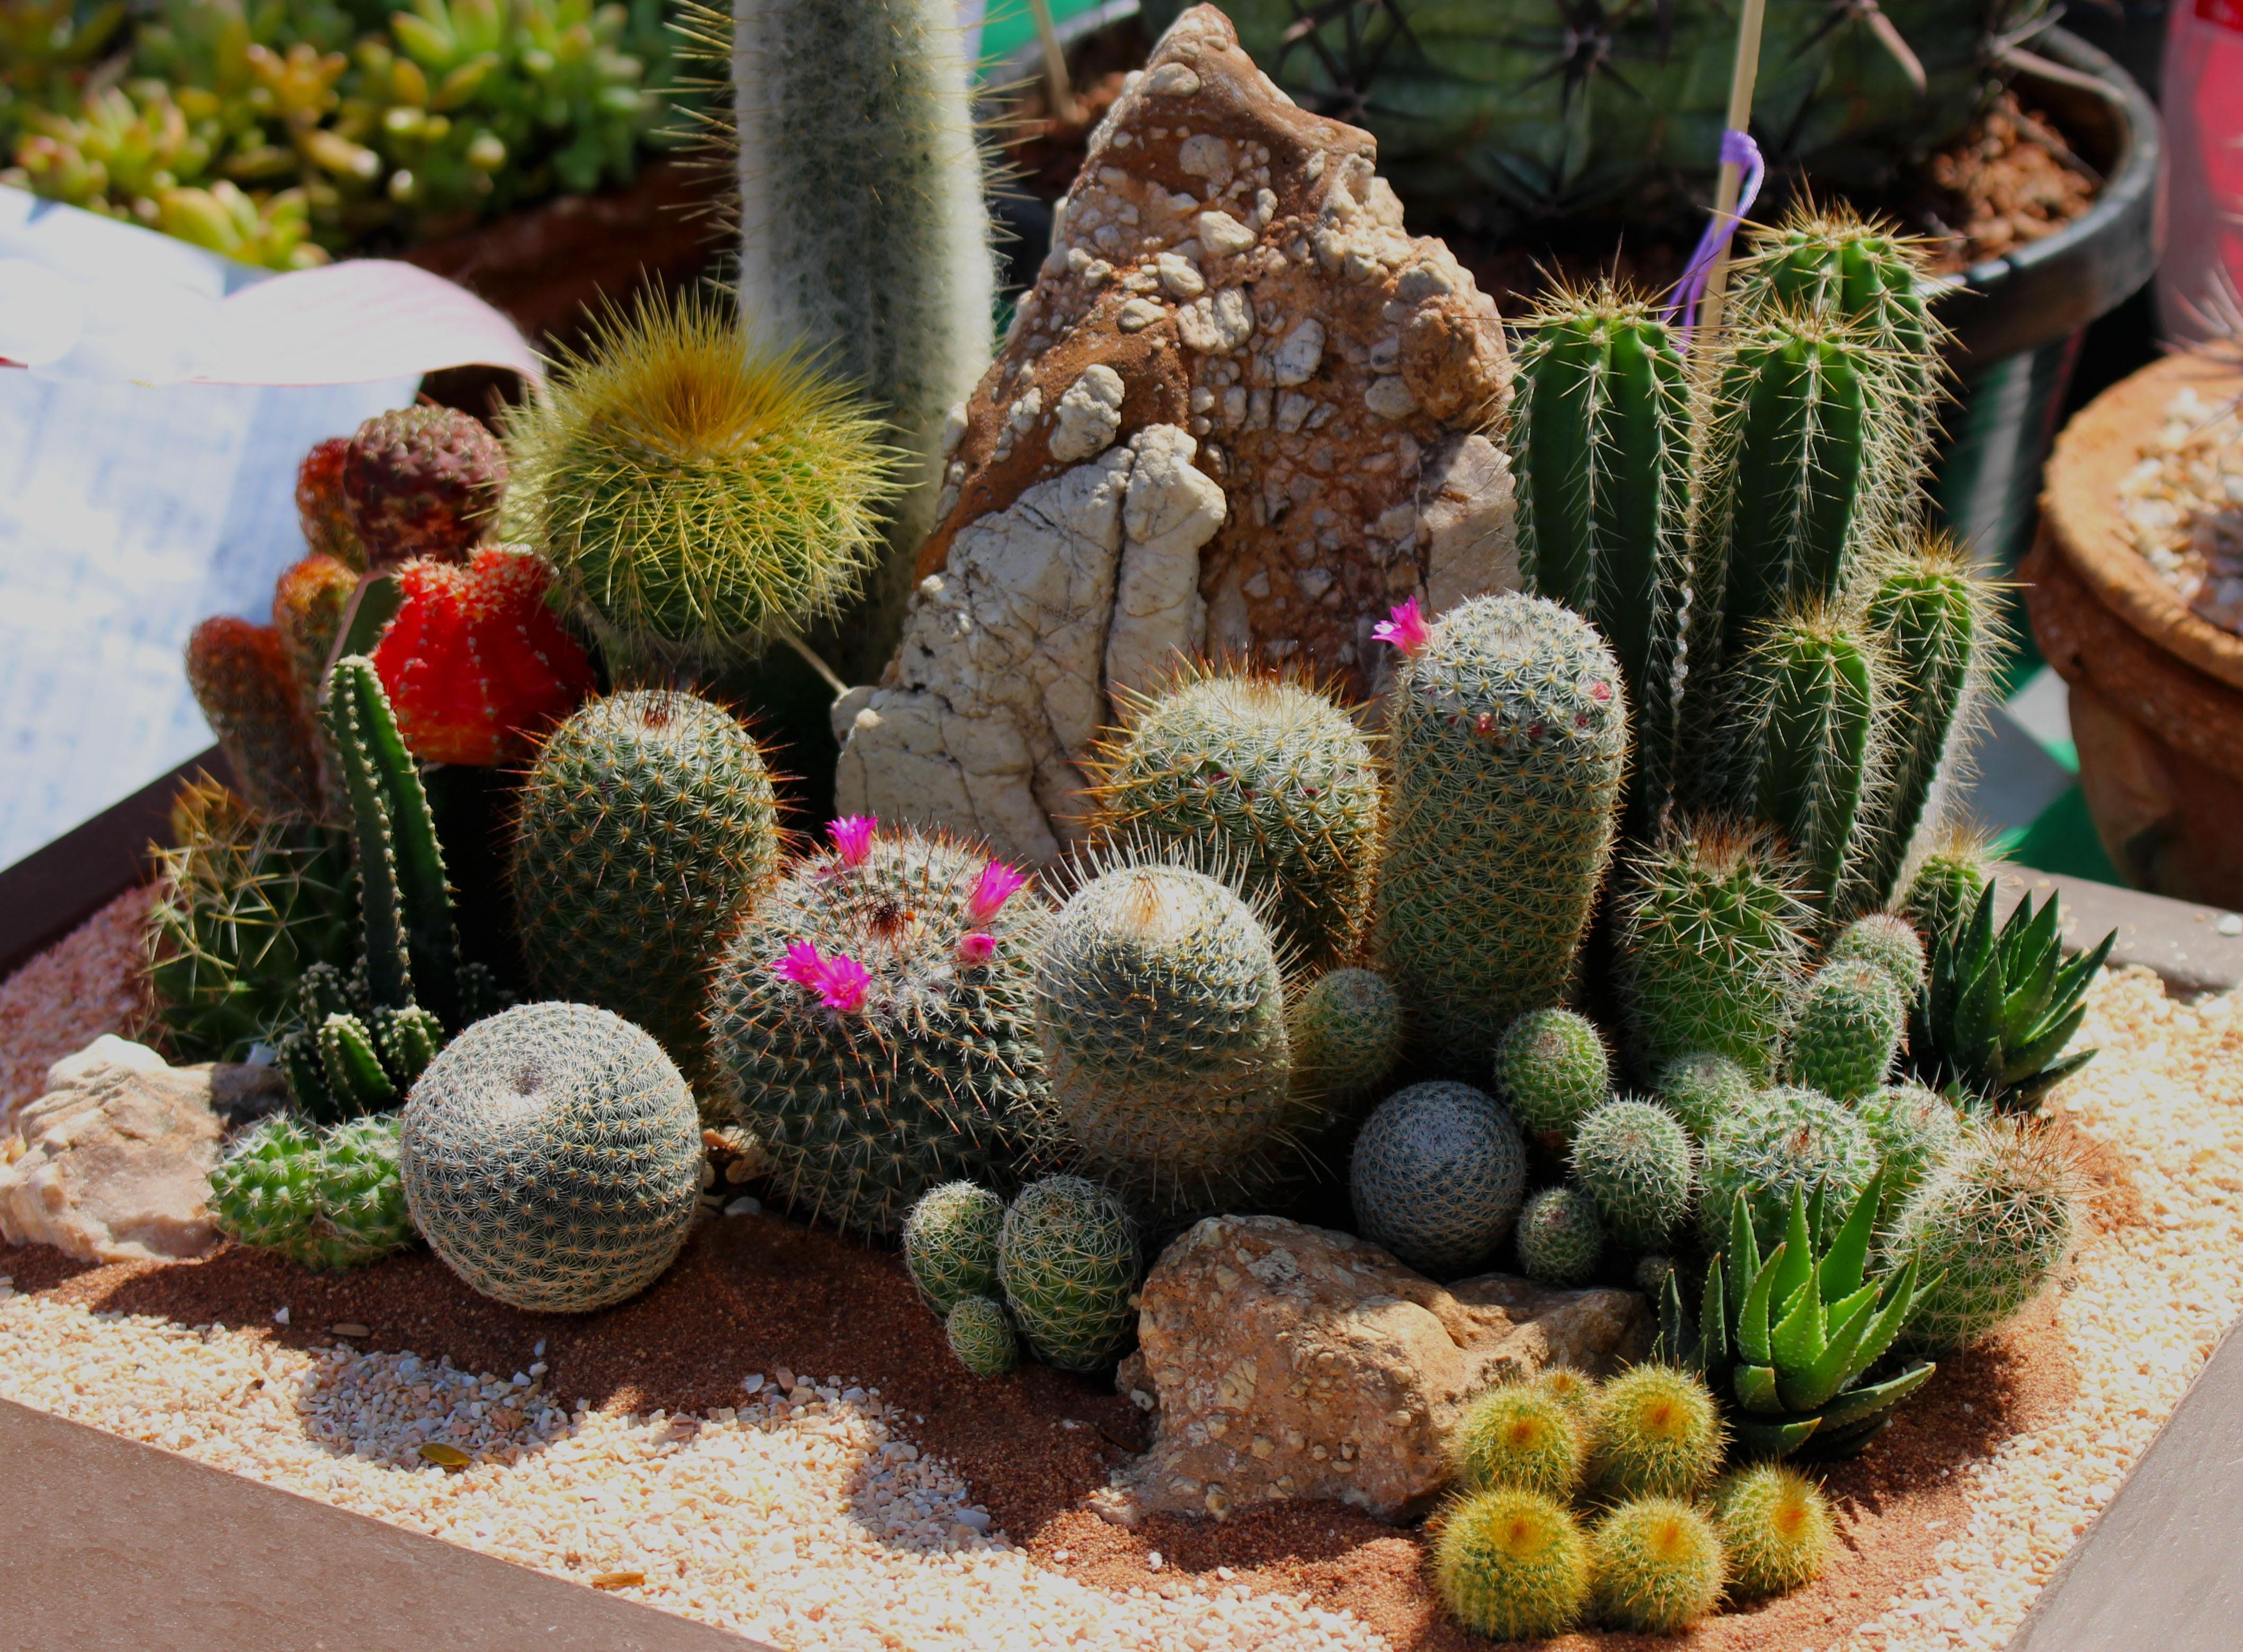 Free Images : nature, outdoor, growth, sunlight, desert, flower ...